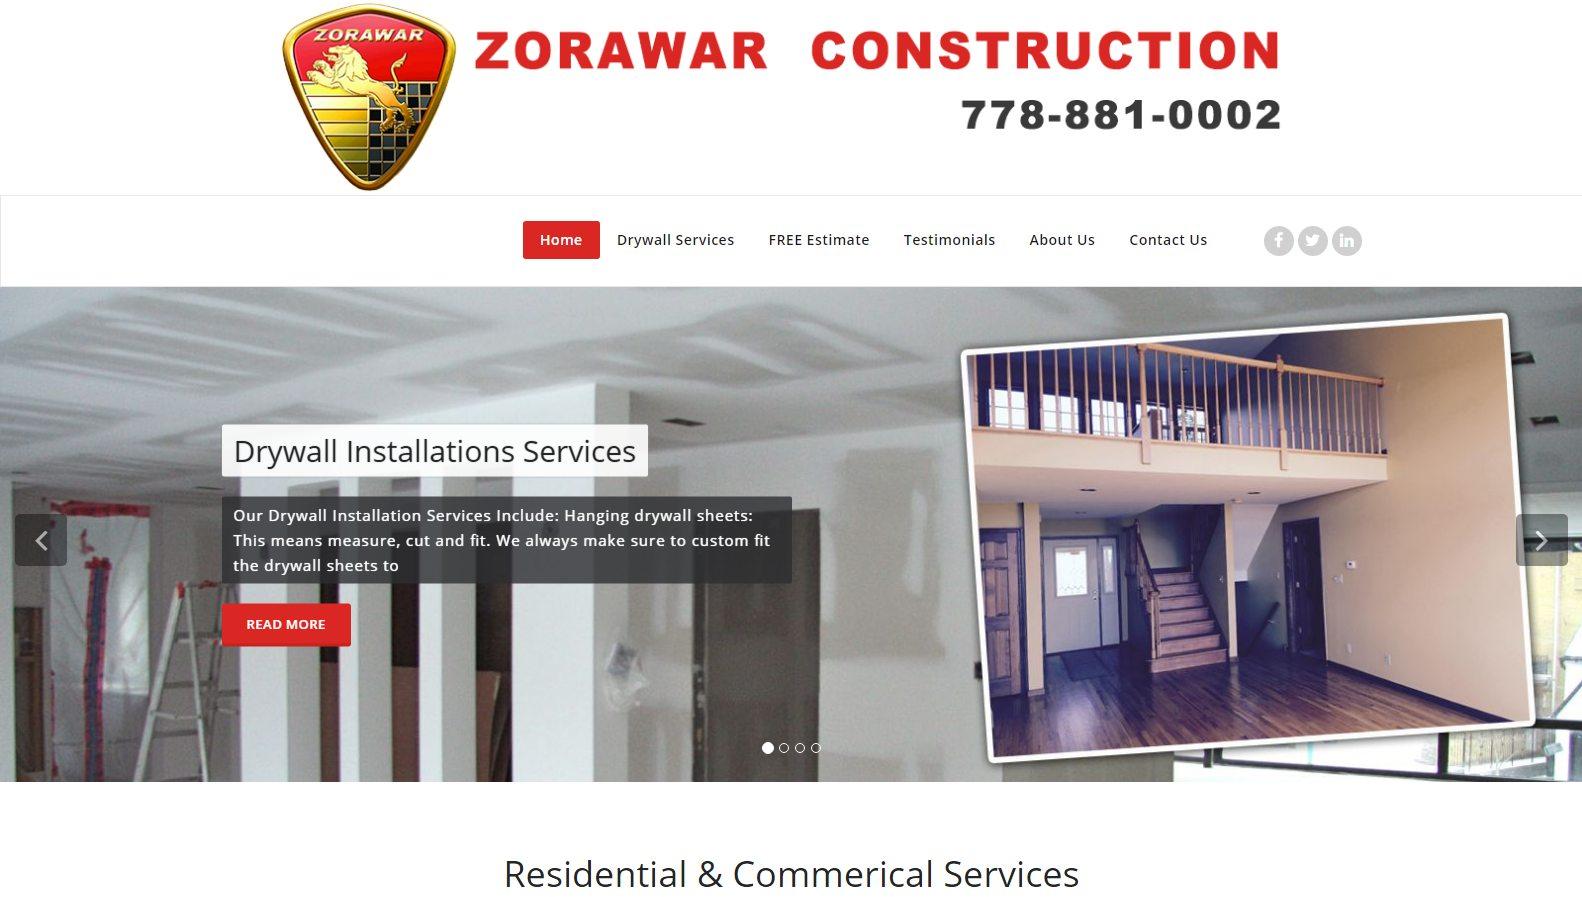 Zorawar Construction - Website Designing By SEOTeam.ca